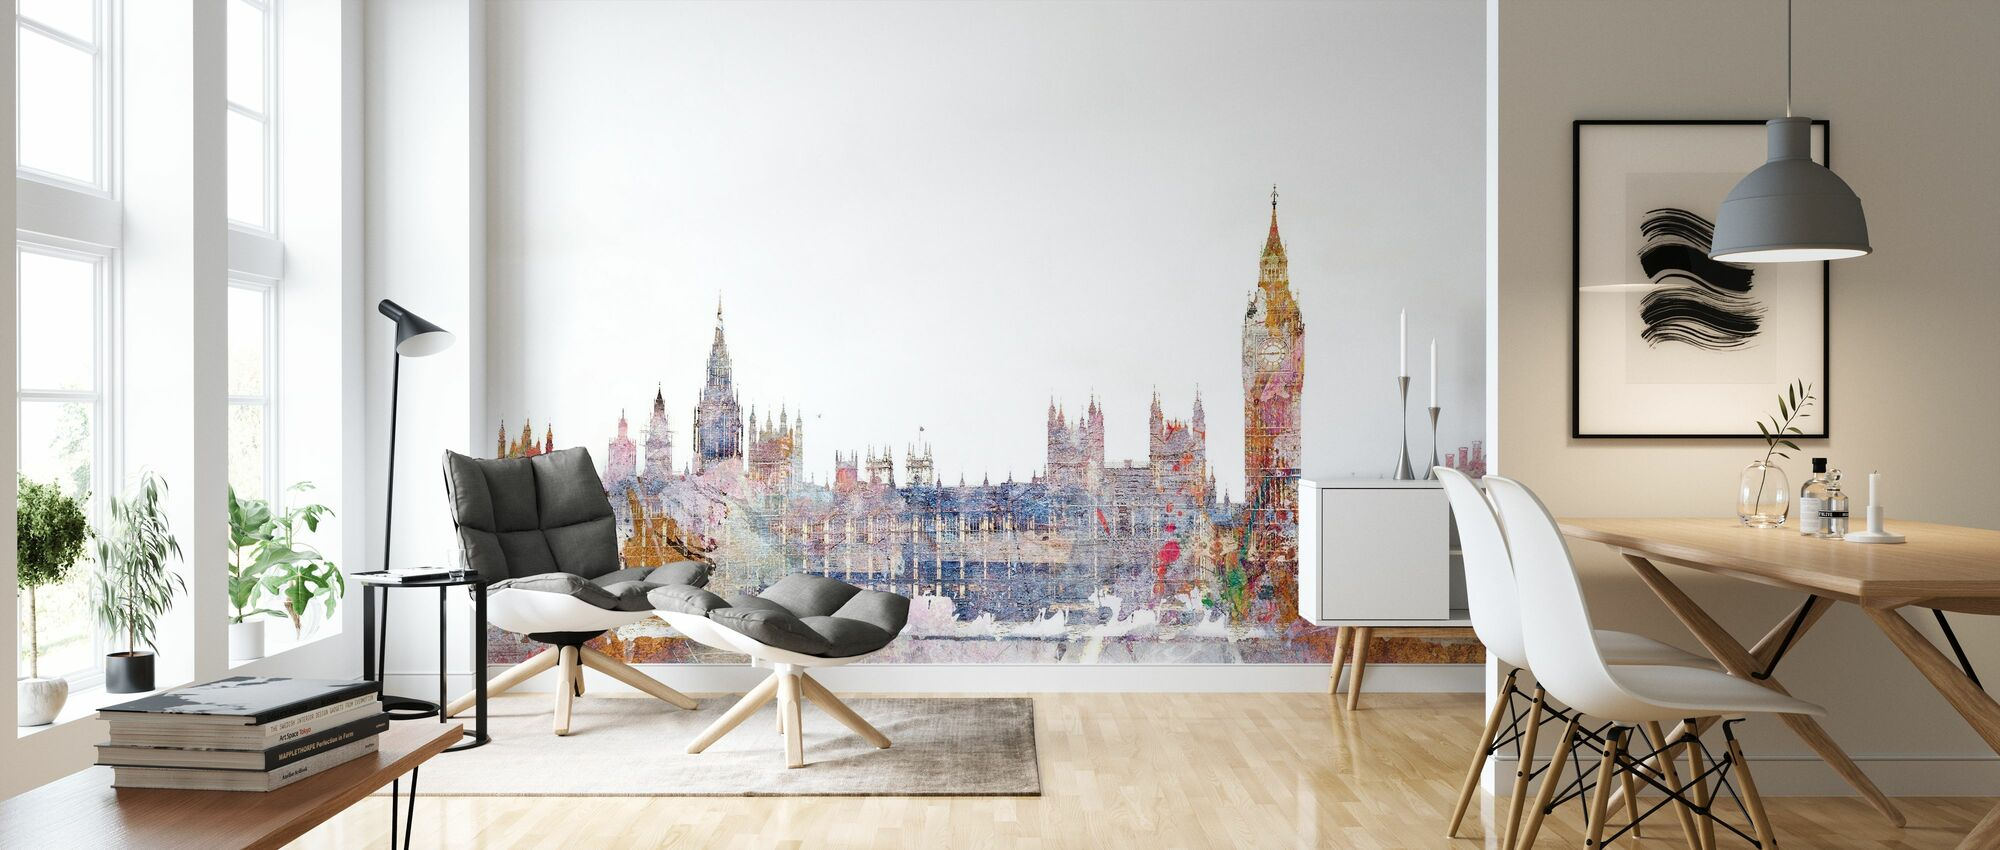 Parlamentet farge splash - Tapet - Stue